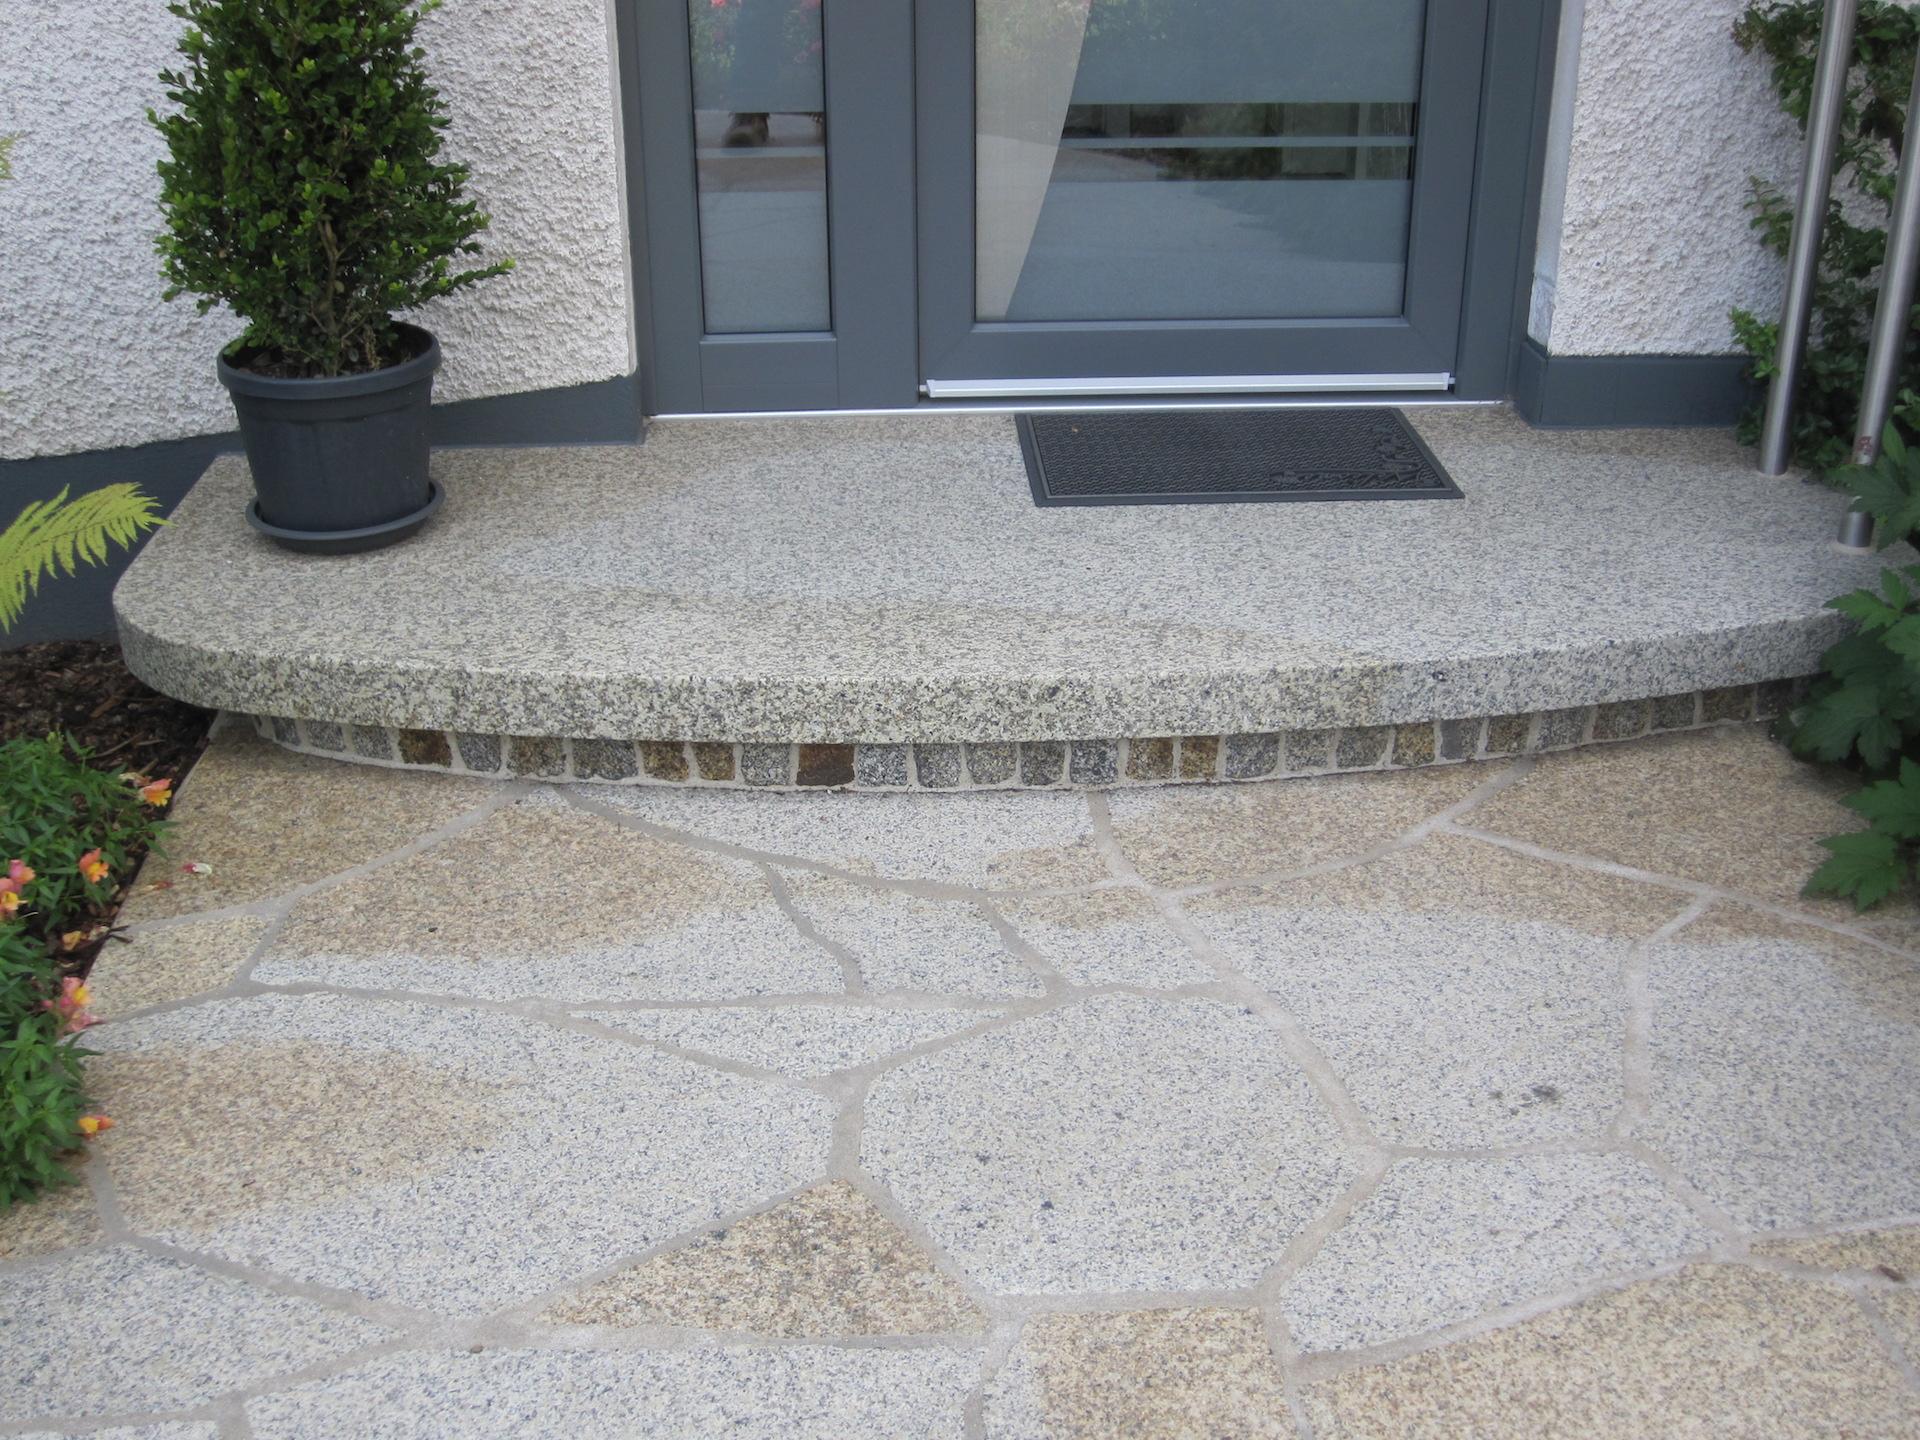 Naturstein Hauseingang mit Granitbodenbelag